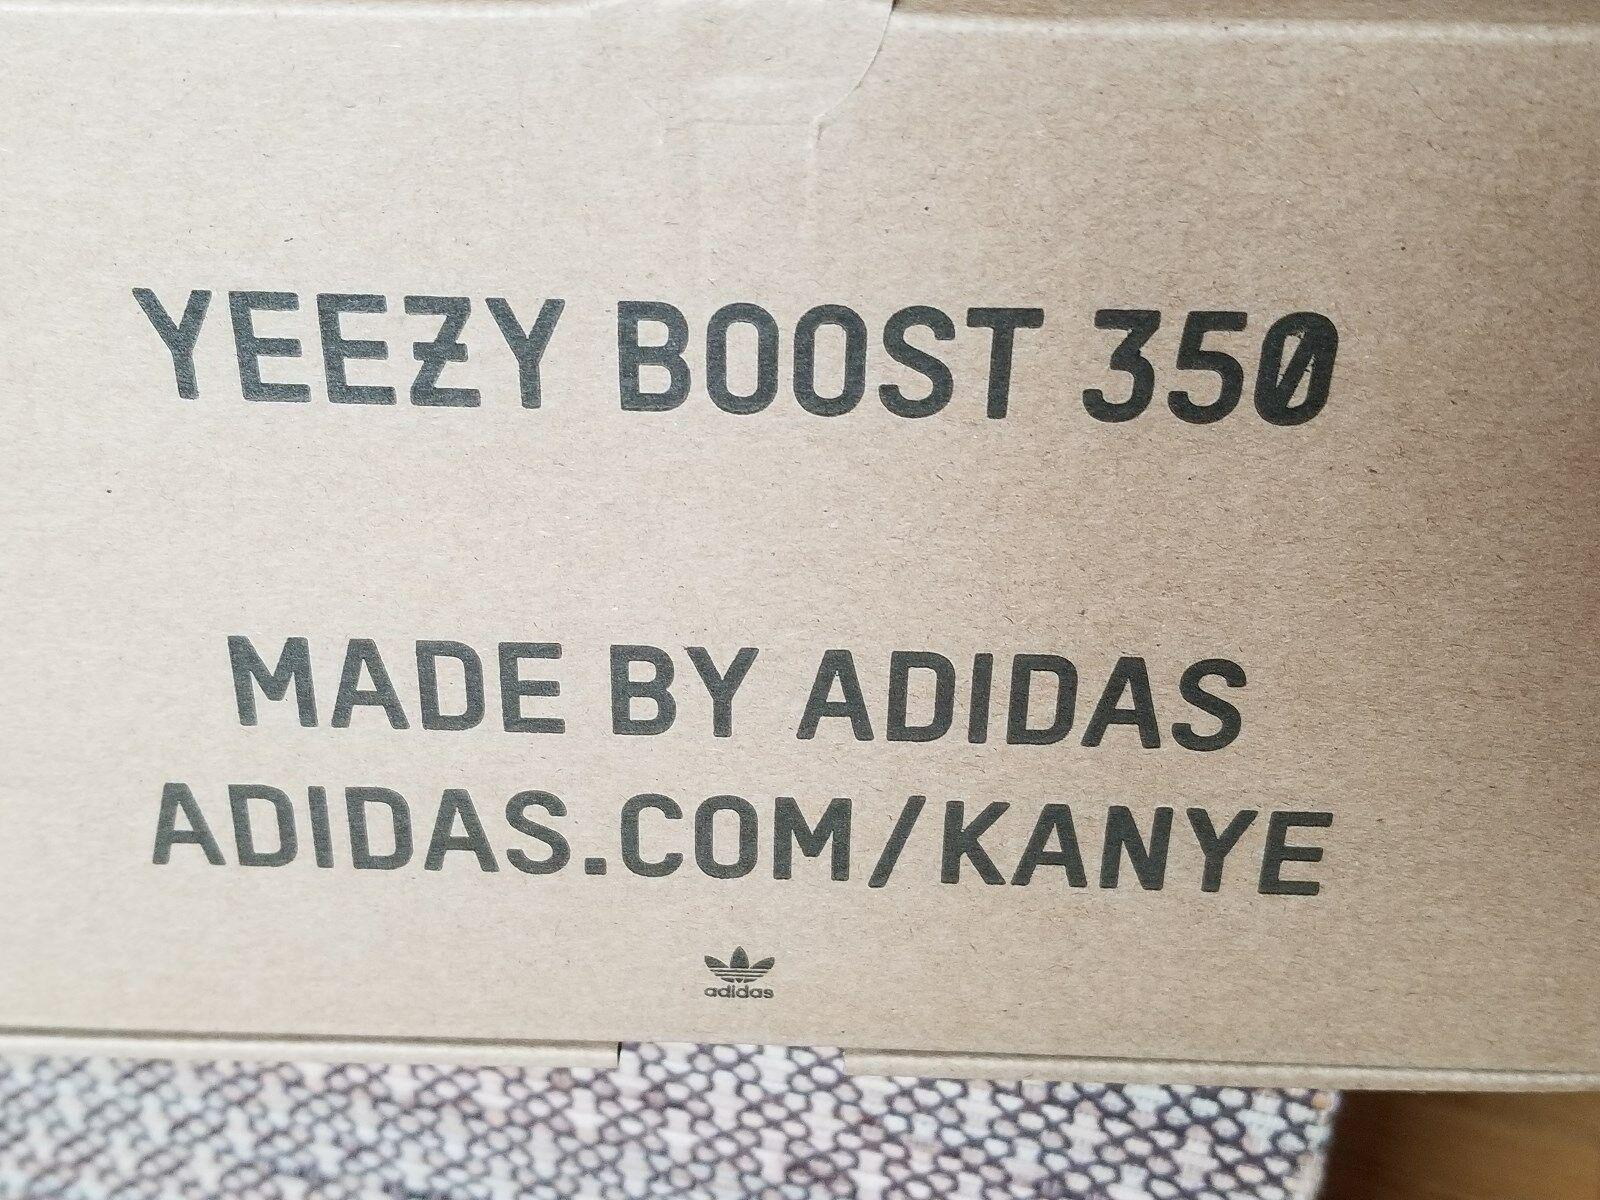 Adidas Yeezy Boost 350 V2 Blau Getönt Grau Rot B37571 Vorrat Neu Box Größe 9.5 image 10